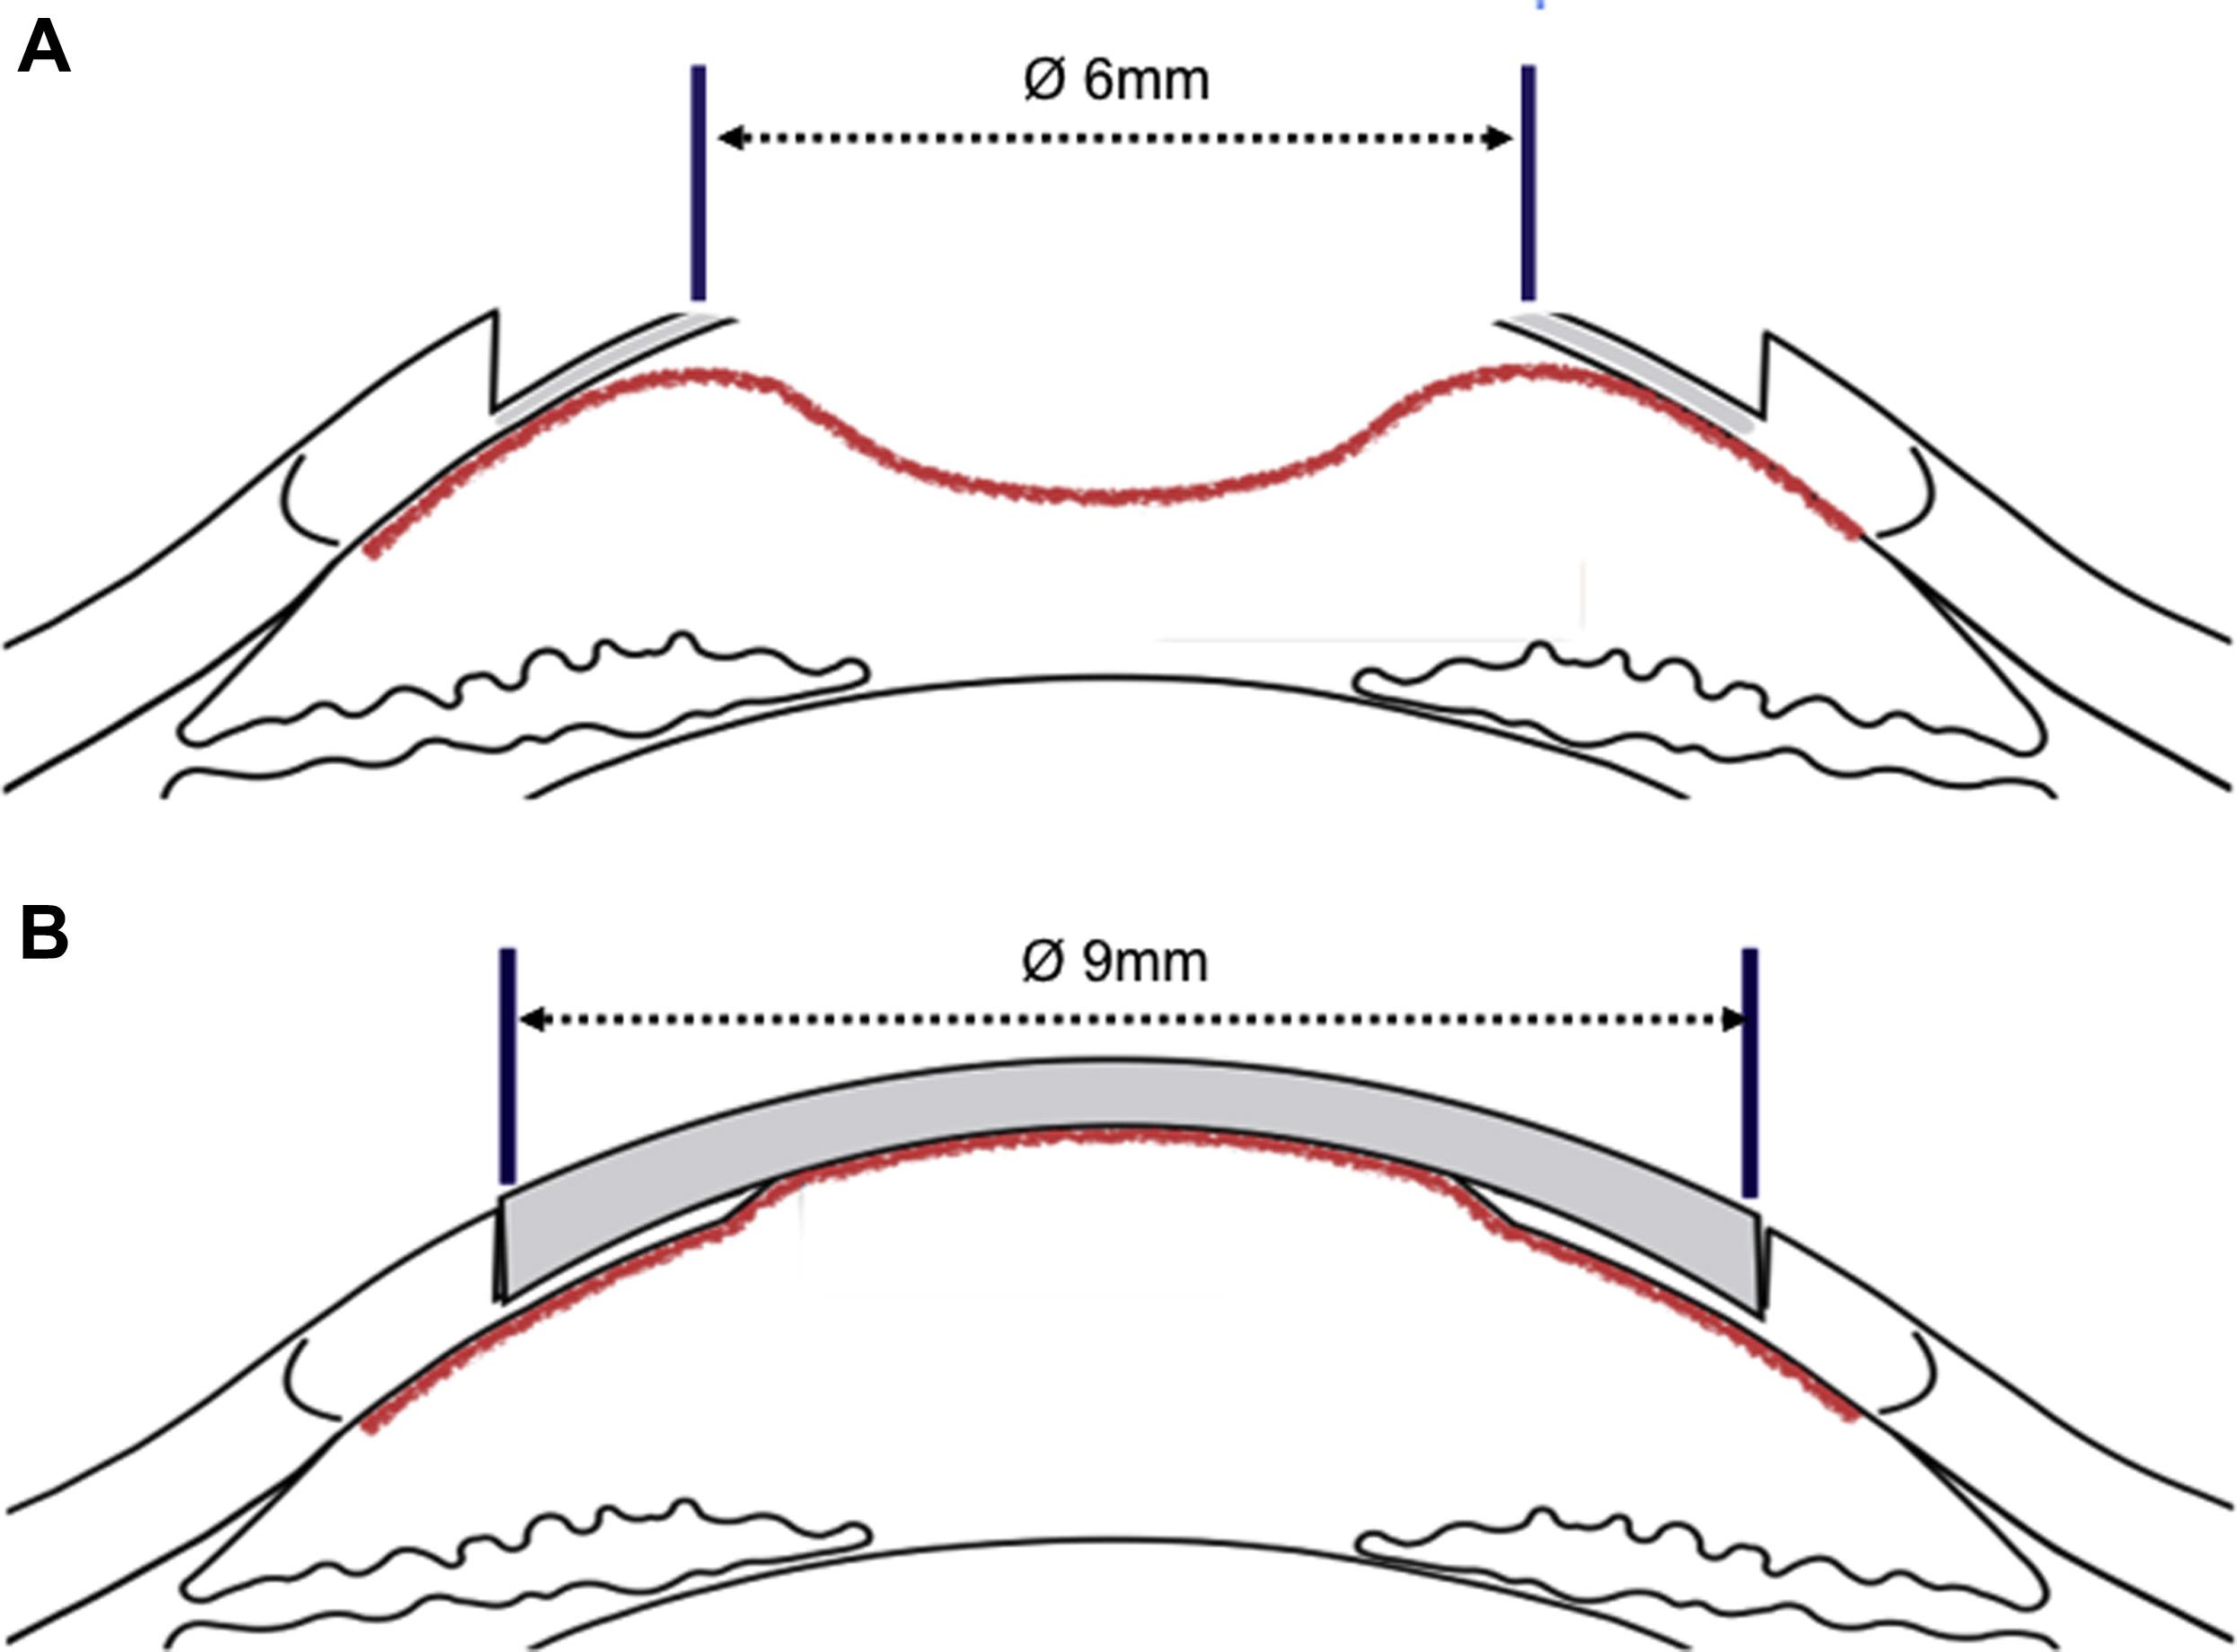 Large 9 Mm Deep Anterior Lamellar Keratoplasty With